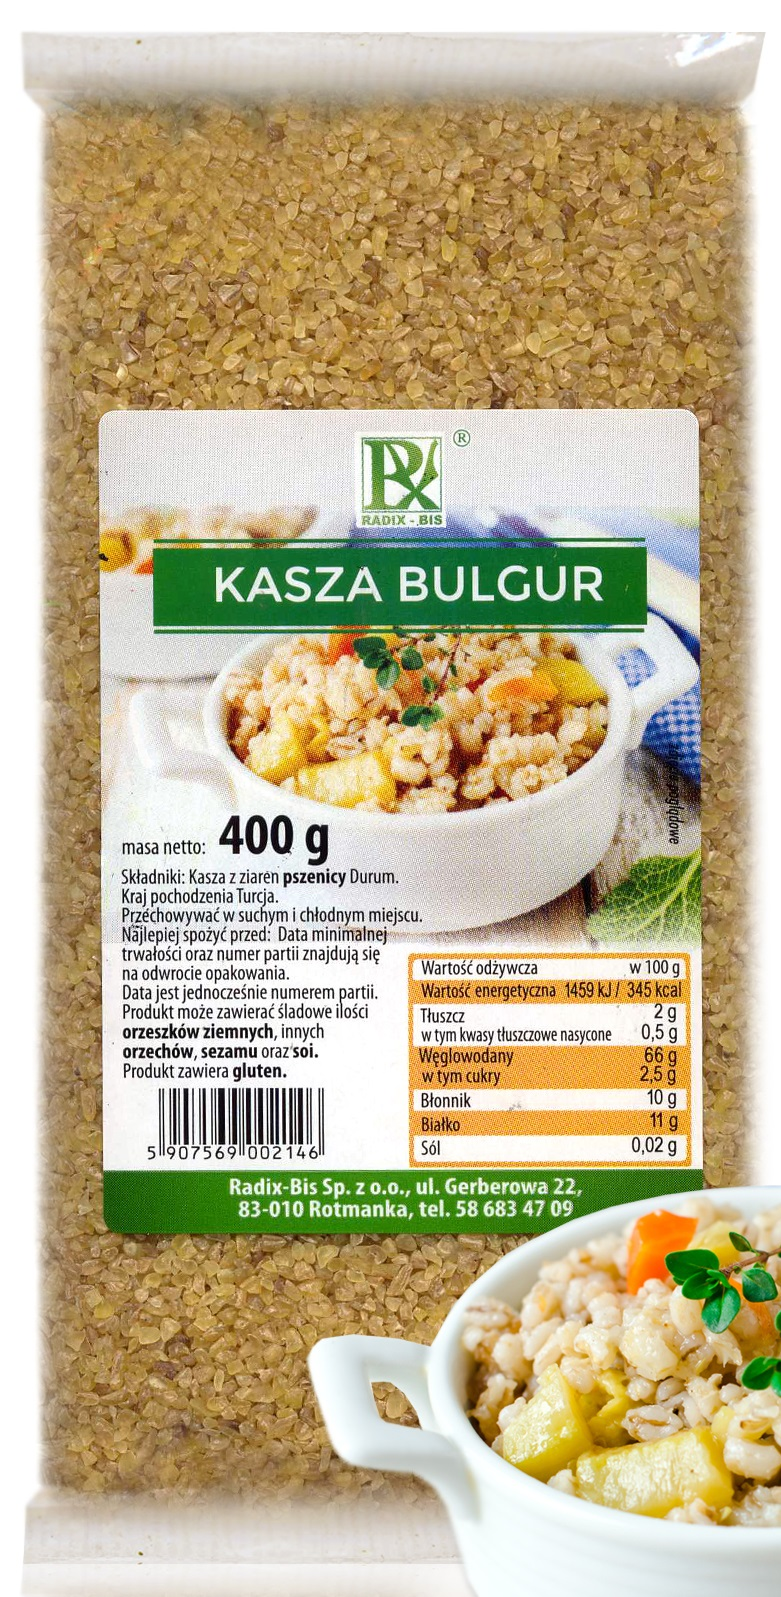 Radix-Bis kasza bulgur